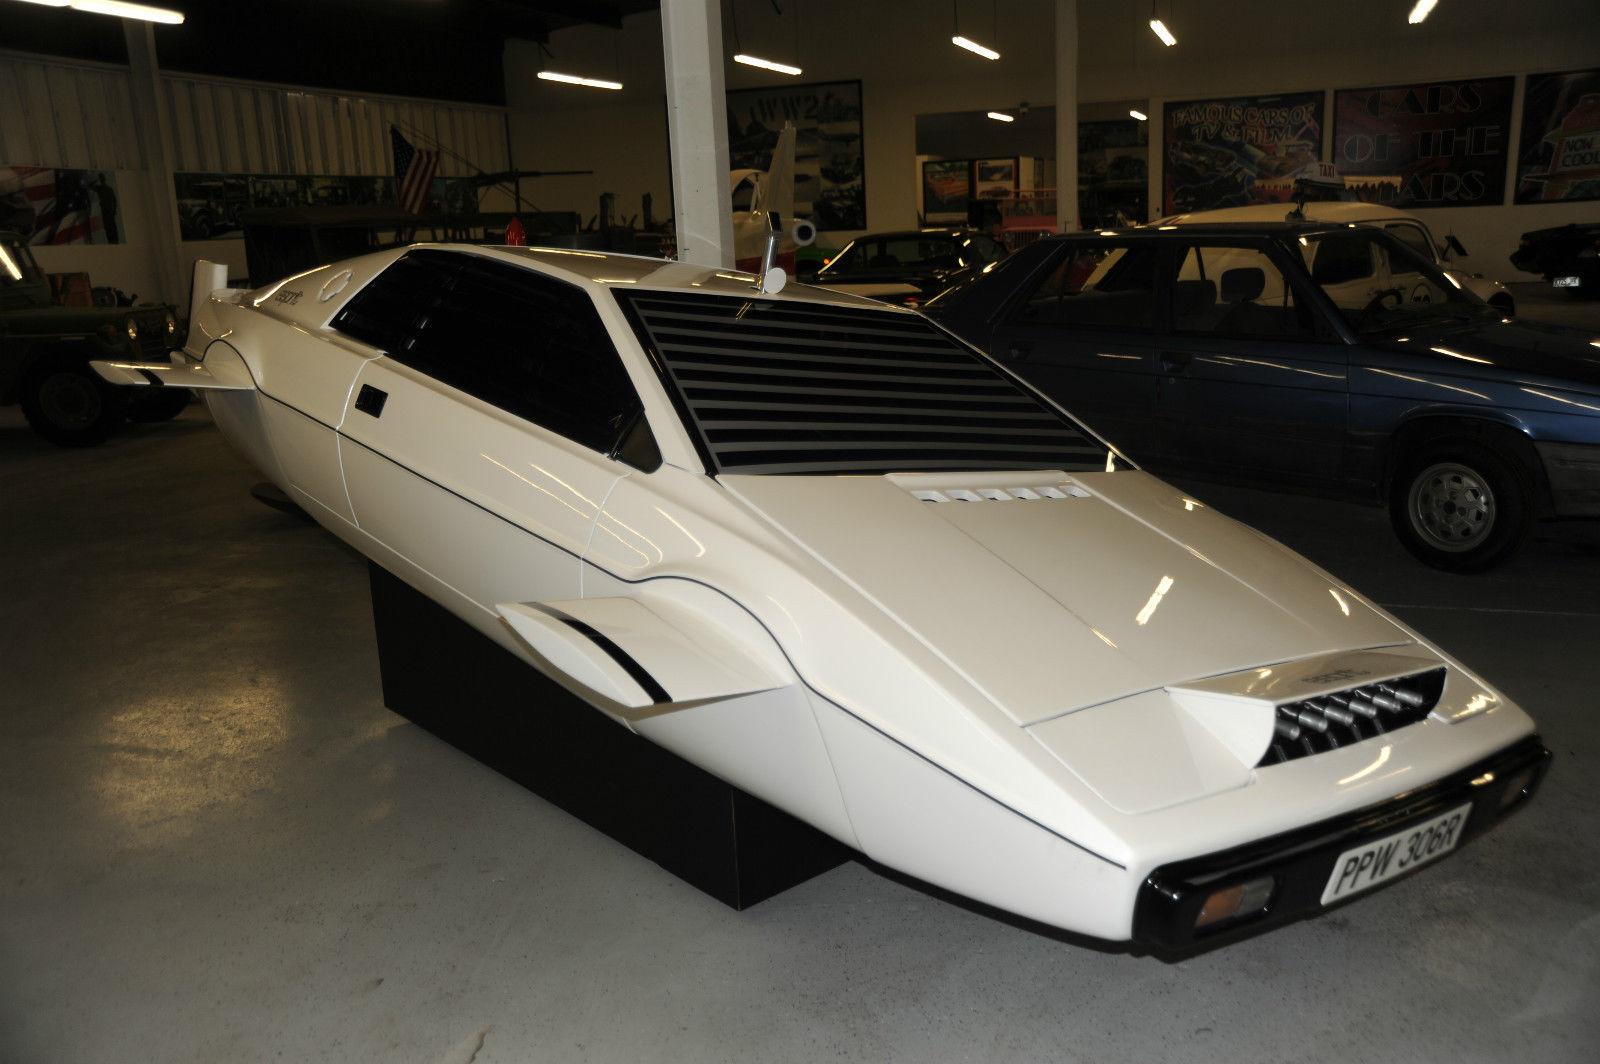 Lotus Esprit Submarine From James Bond For Sale on eBay - GTspirit